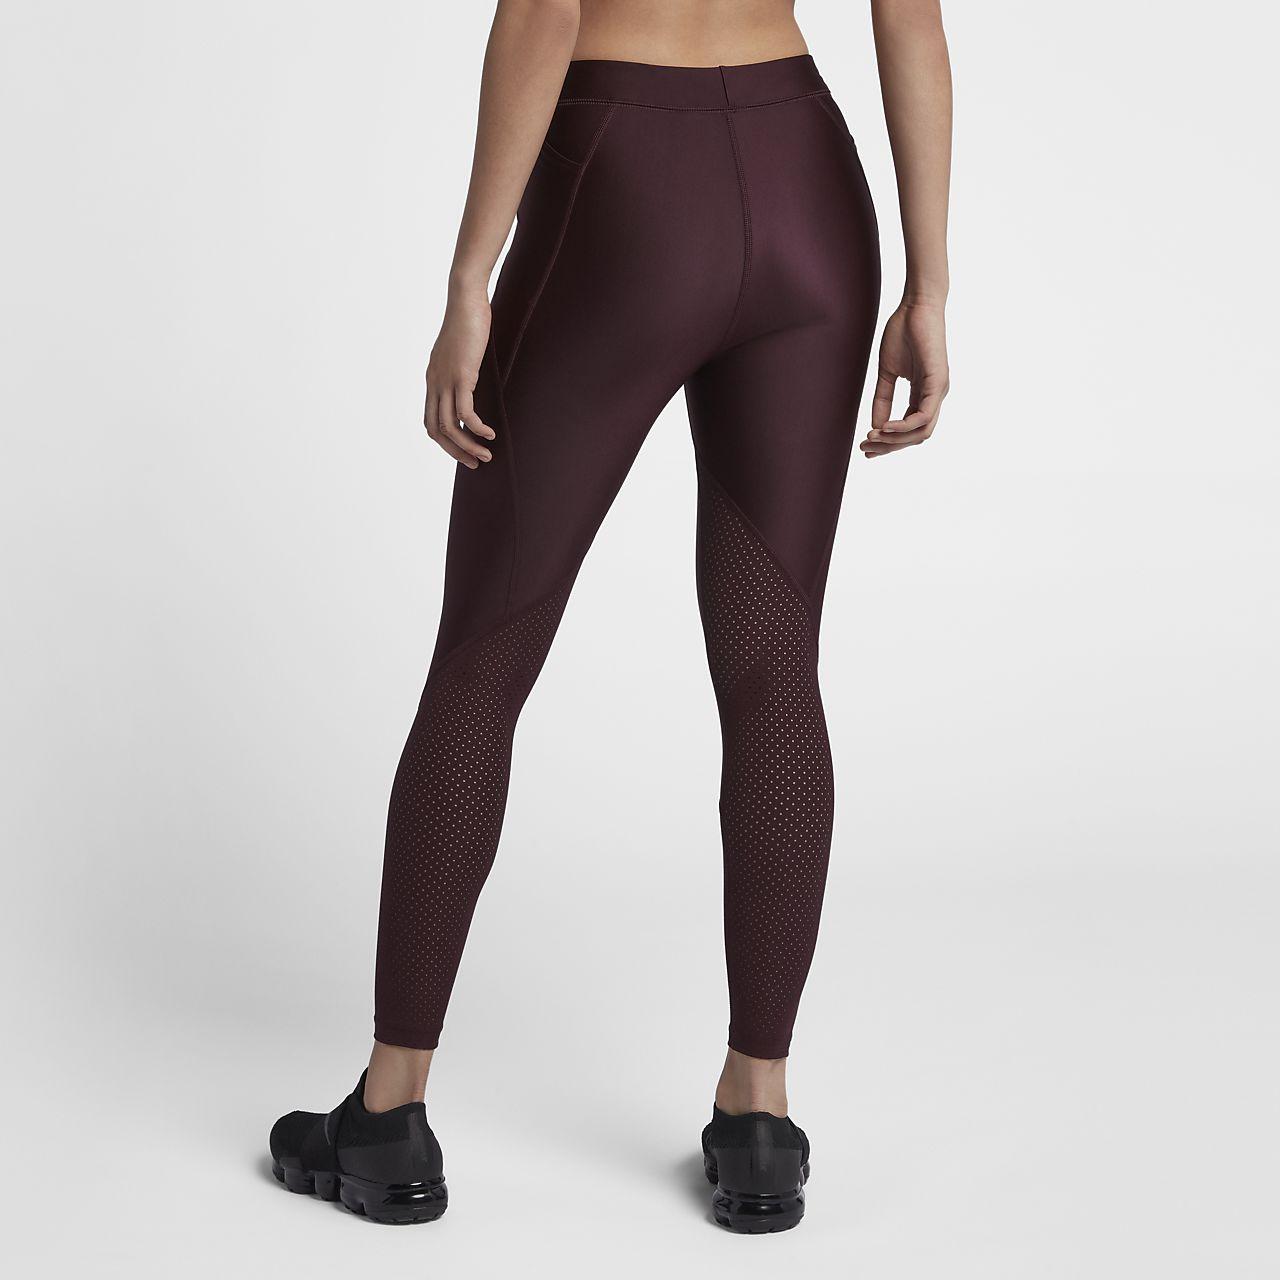 688c417492dd1 Nike Speed Women's Mid-Rise 64cm Running Tights. Nike.com AU